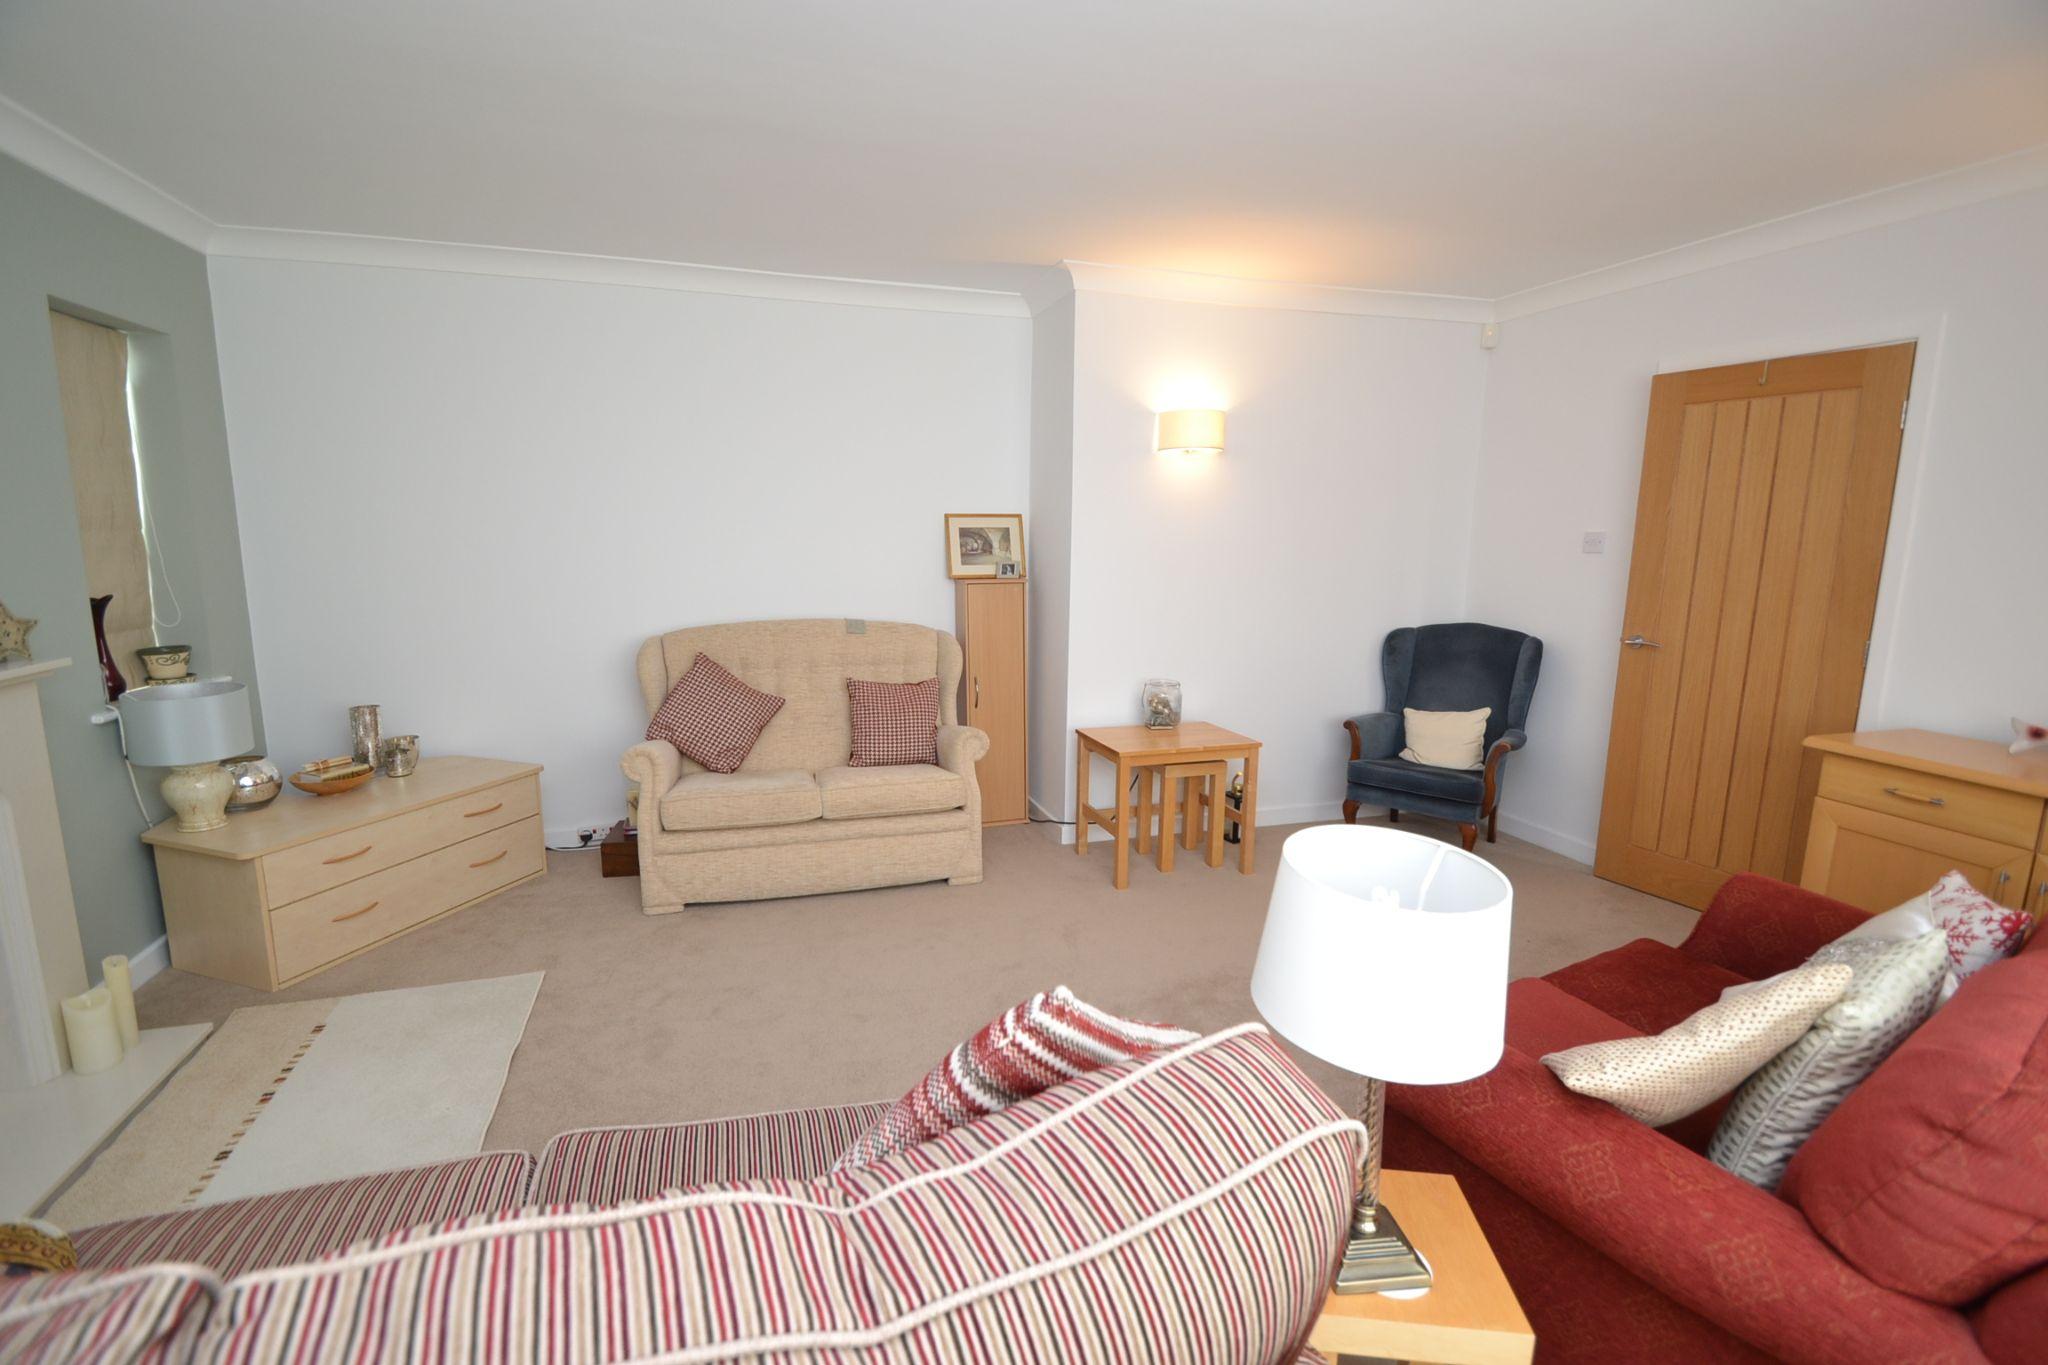 2 Bedroom Semi-detached Dormer House For Sale - Photograph 4